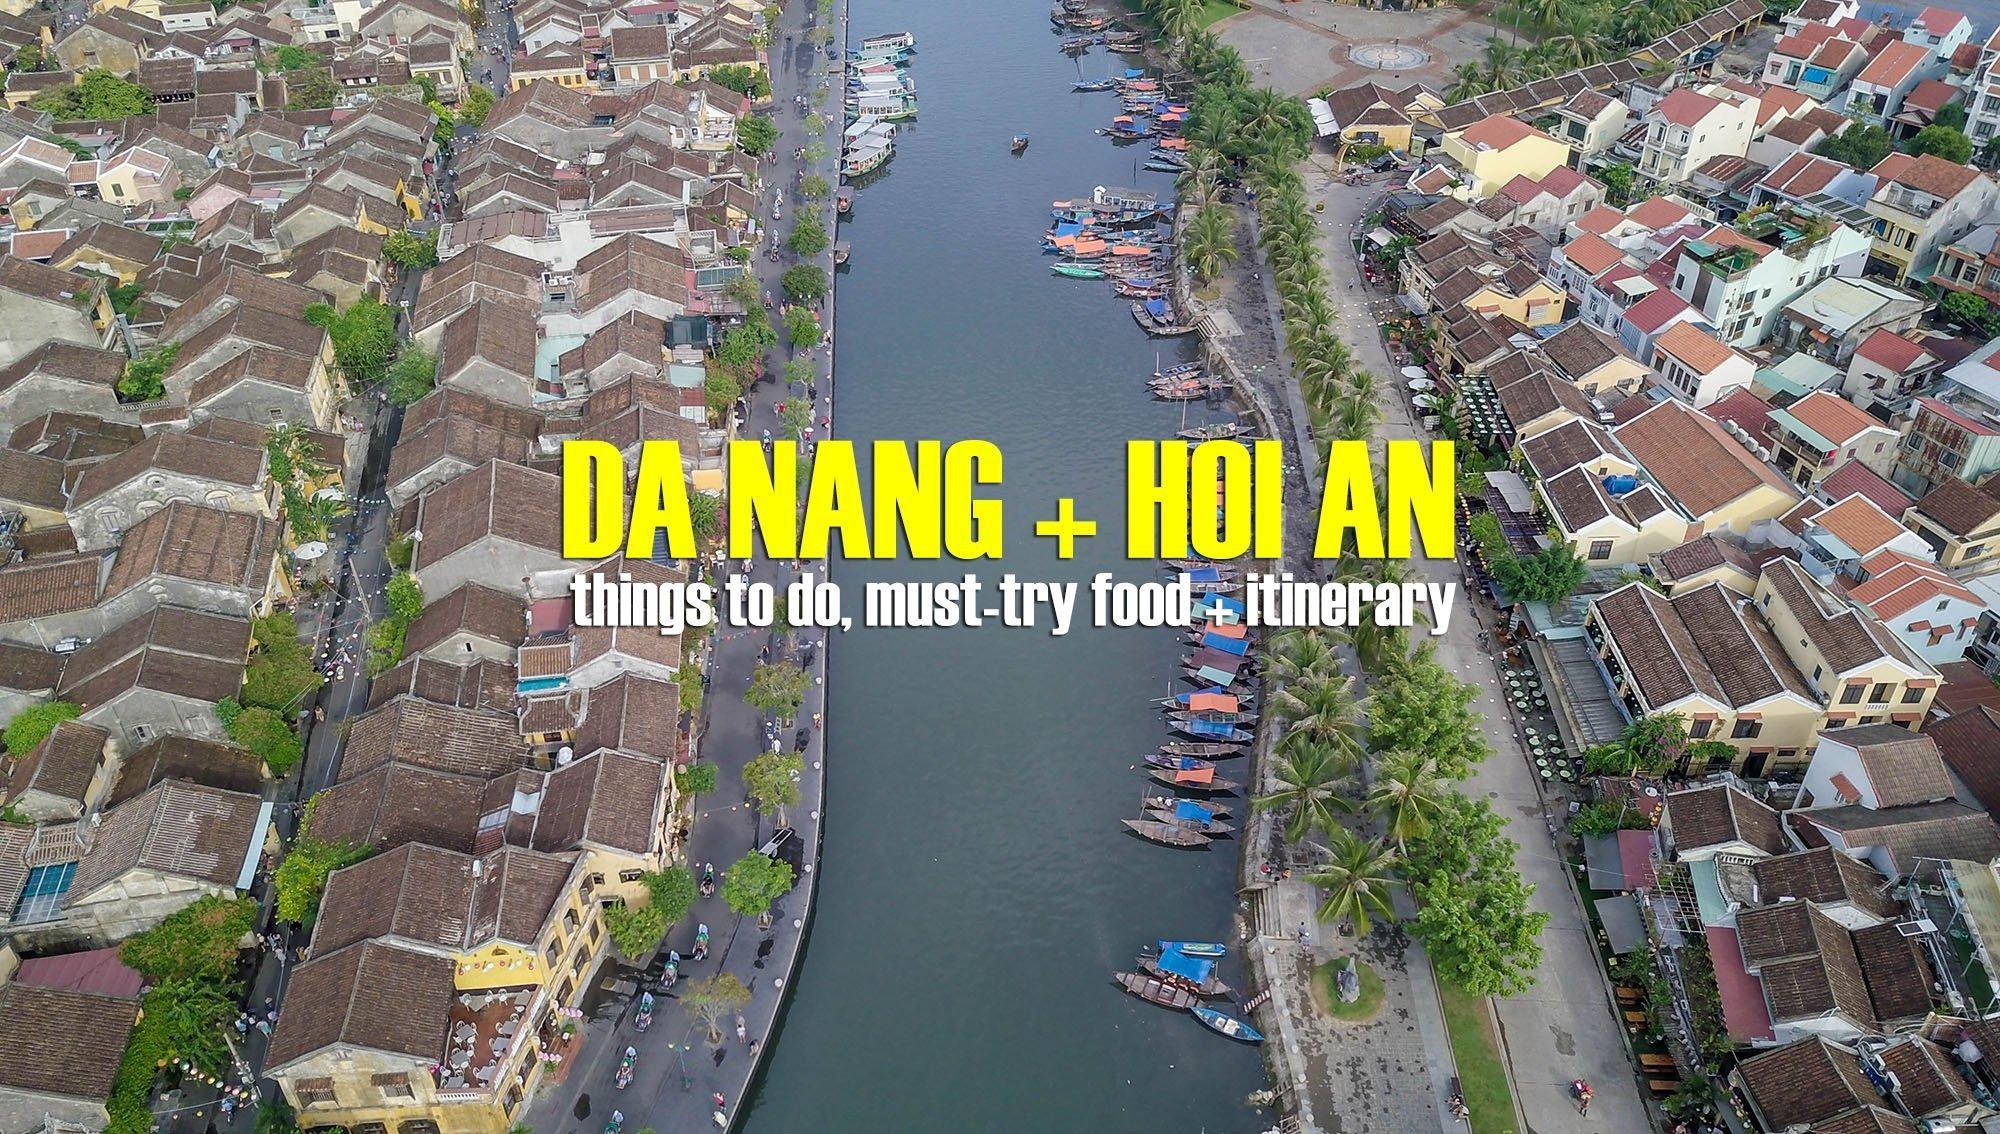 Da Nang + Hoi An Travel Guide Blog: Things to Do & Itinerary